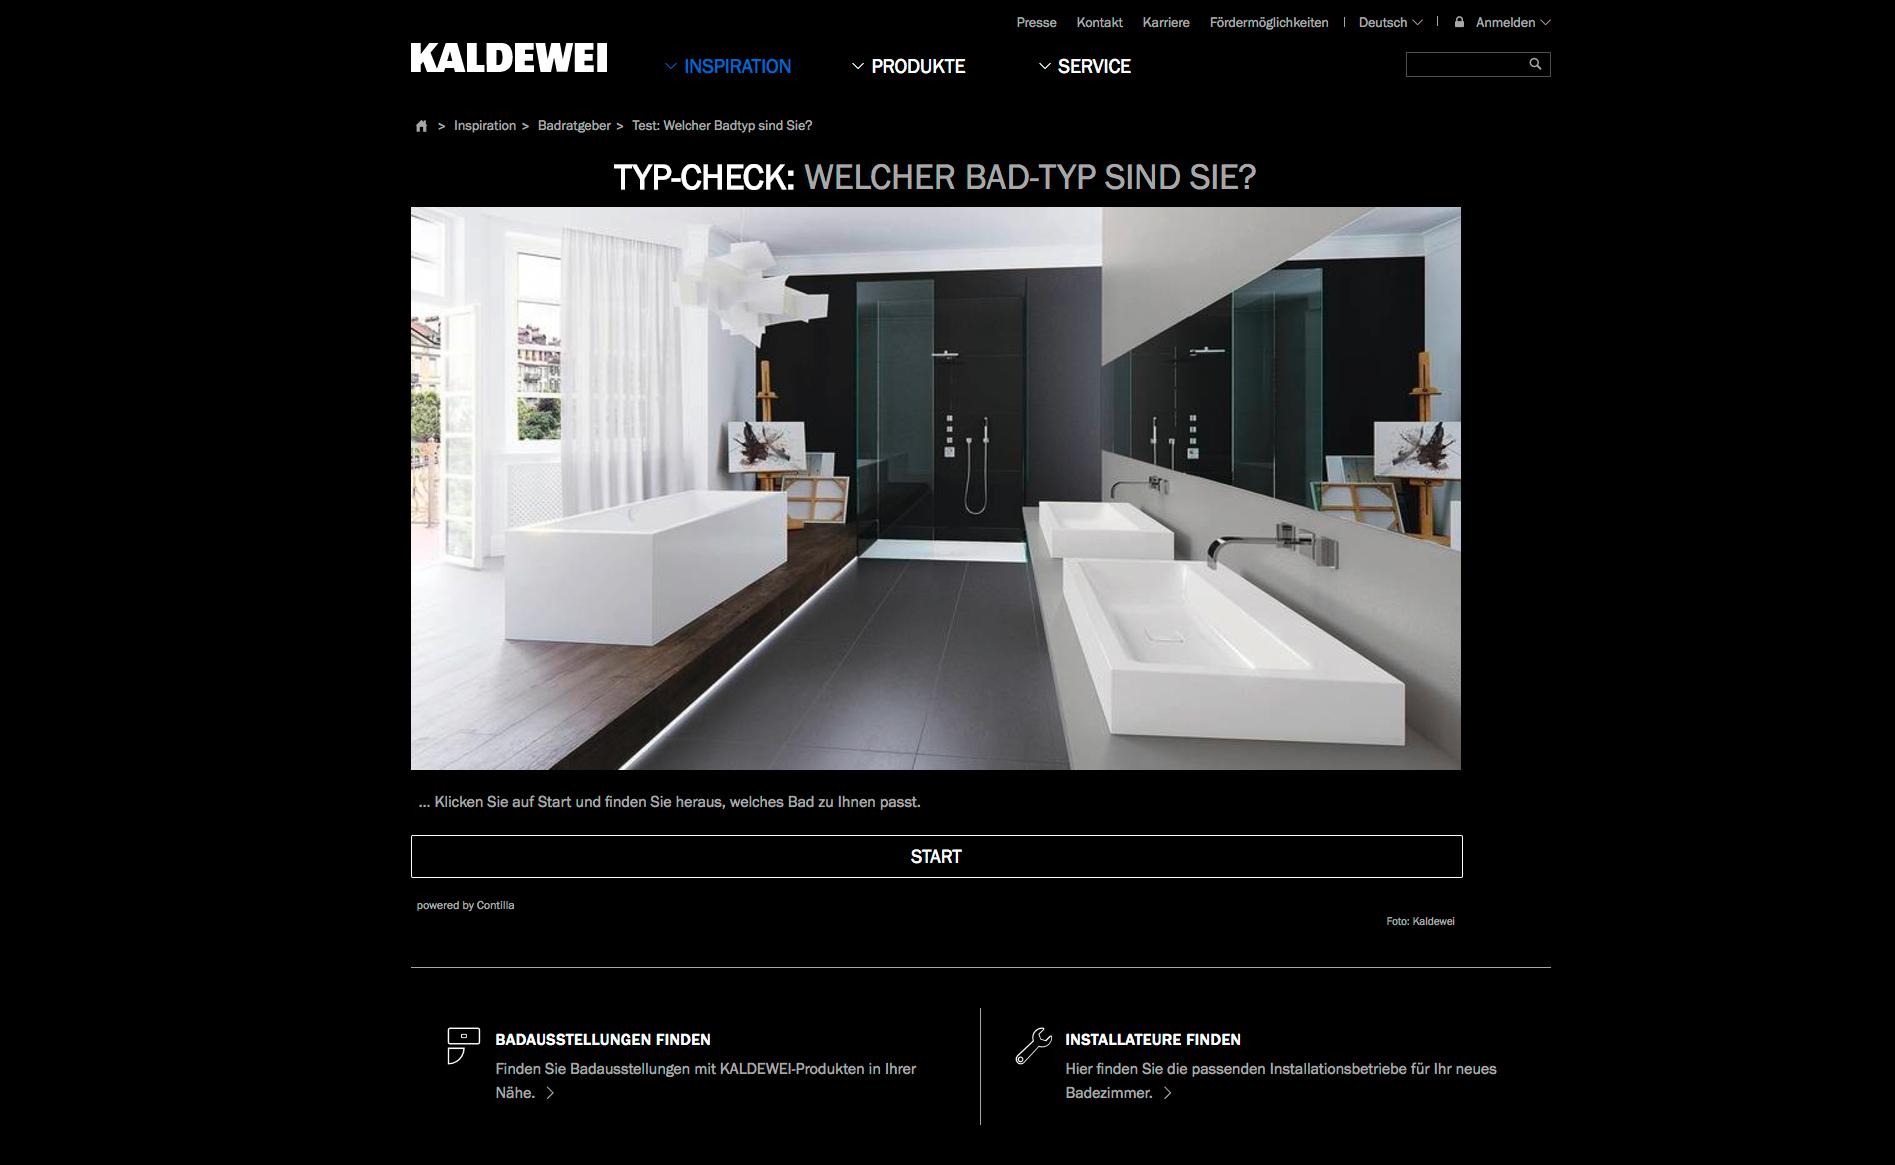 shk profi themen bad design unternehmen markt kaldewei tool zur kundenberatung. Black Bedroom Furniture Sets. Home Design Ideas